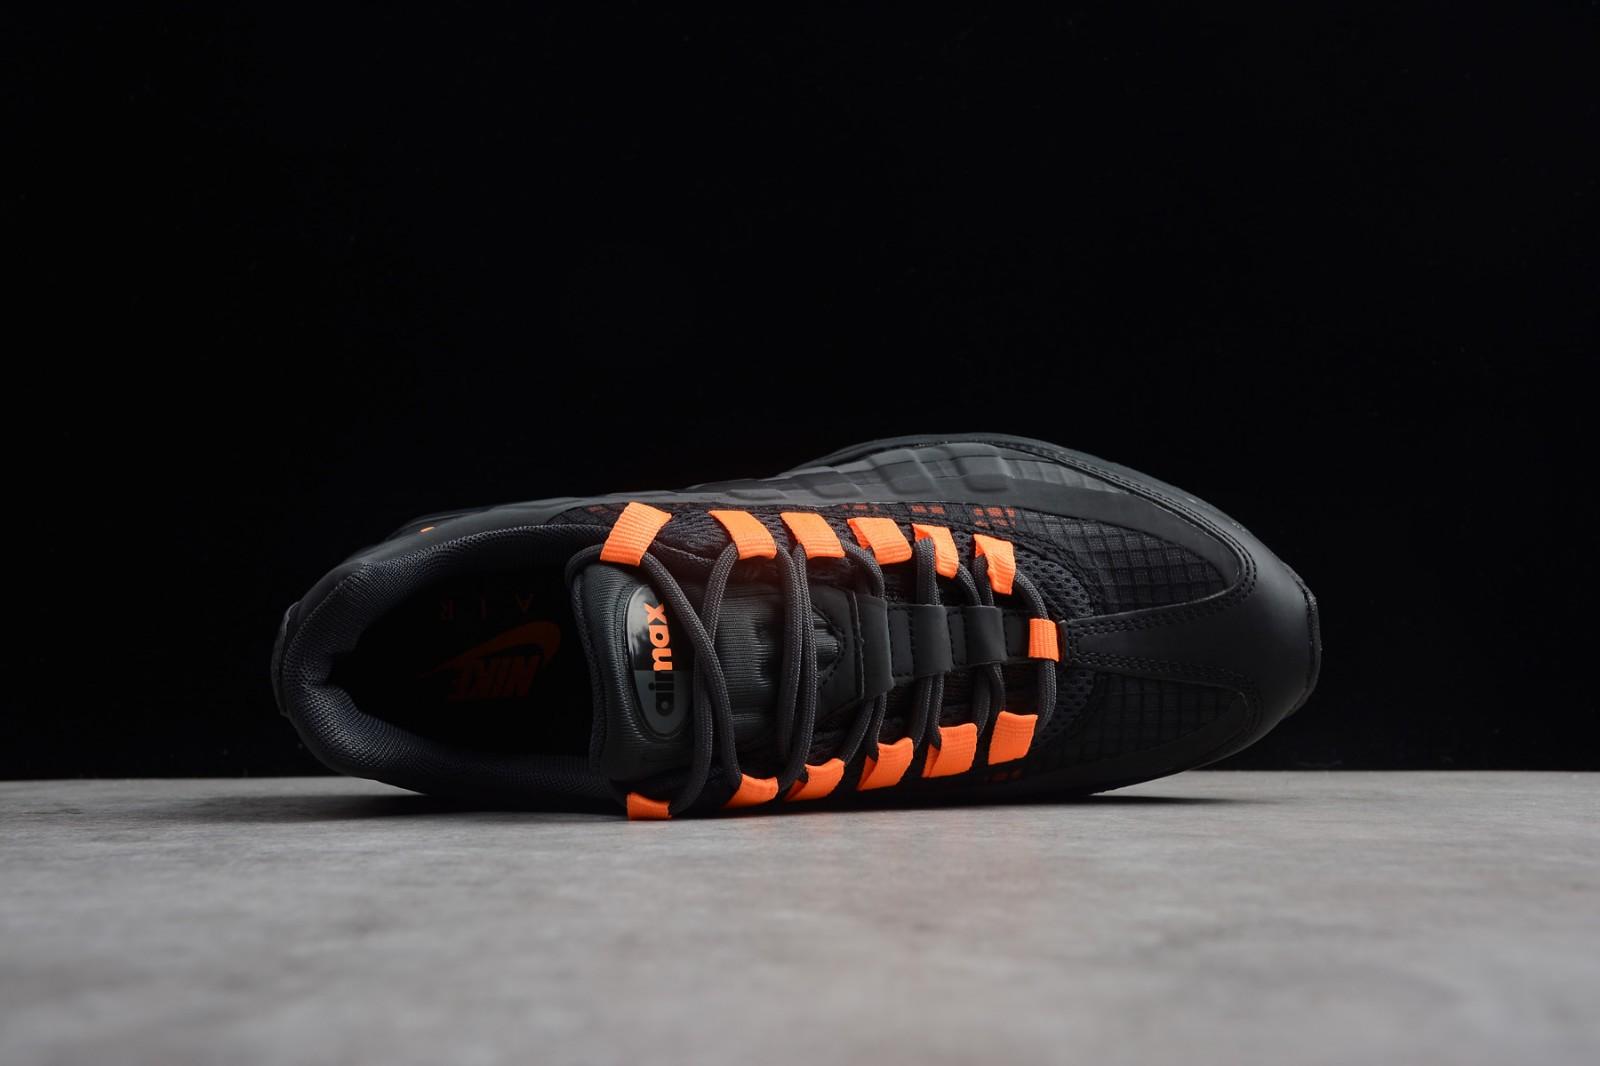 a3e4f8d71bf Nike Air Max 95 Ultra SE Black Total Orange AO9566-001 - Febbuy